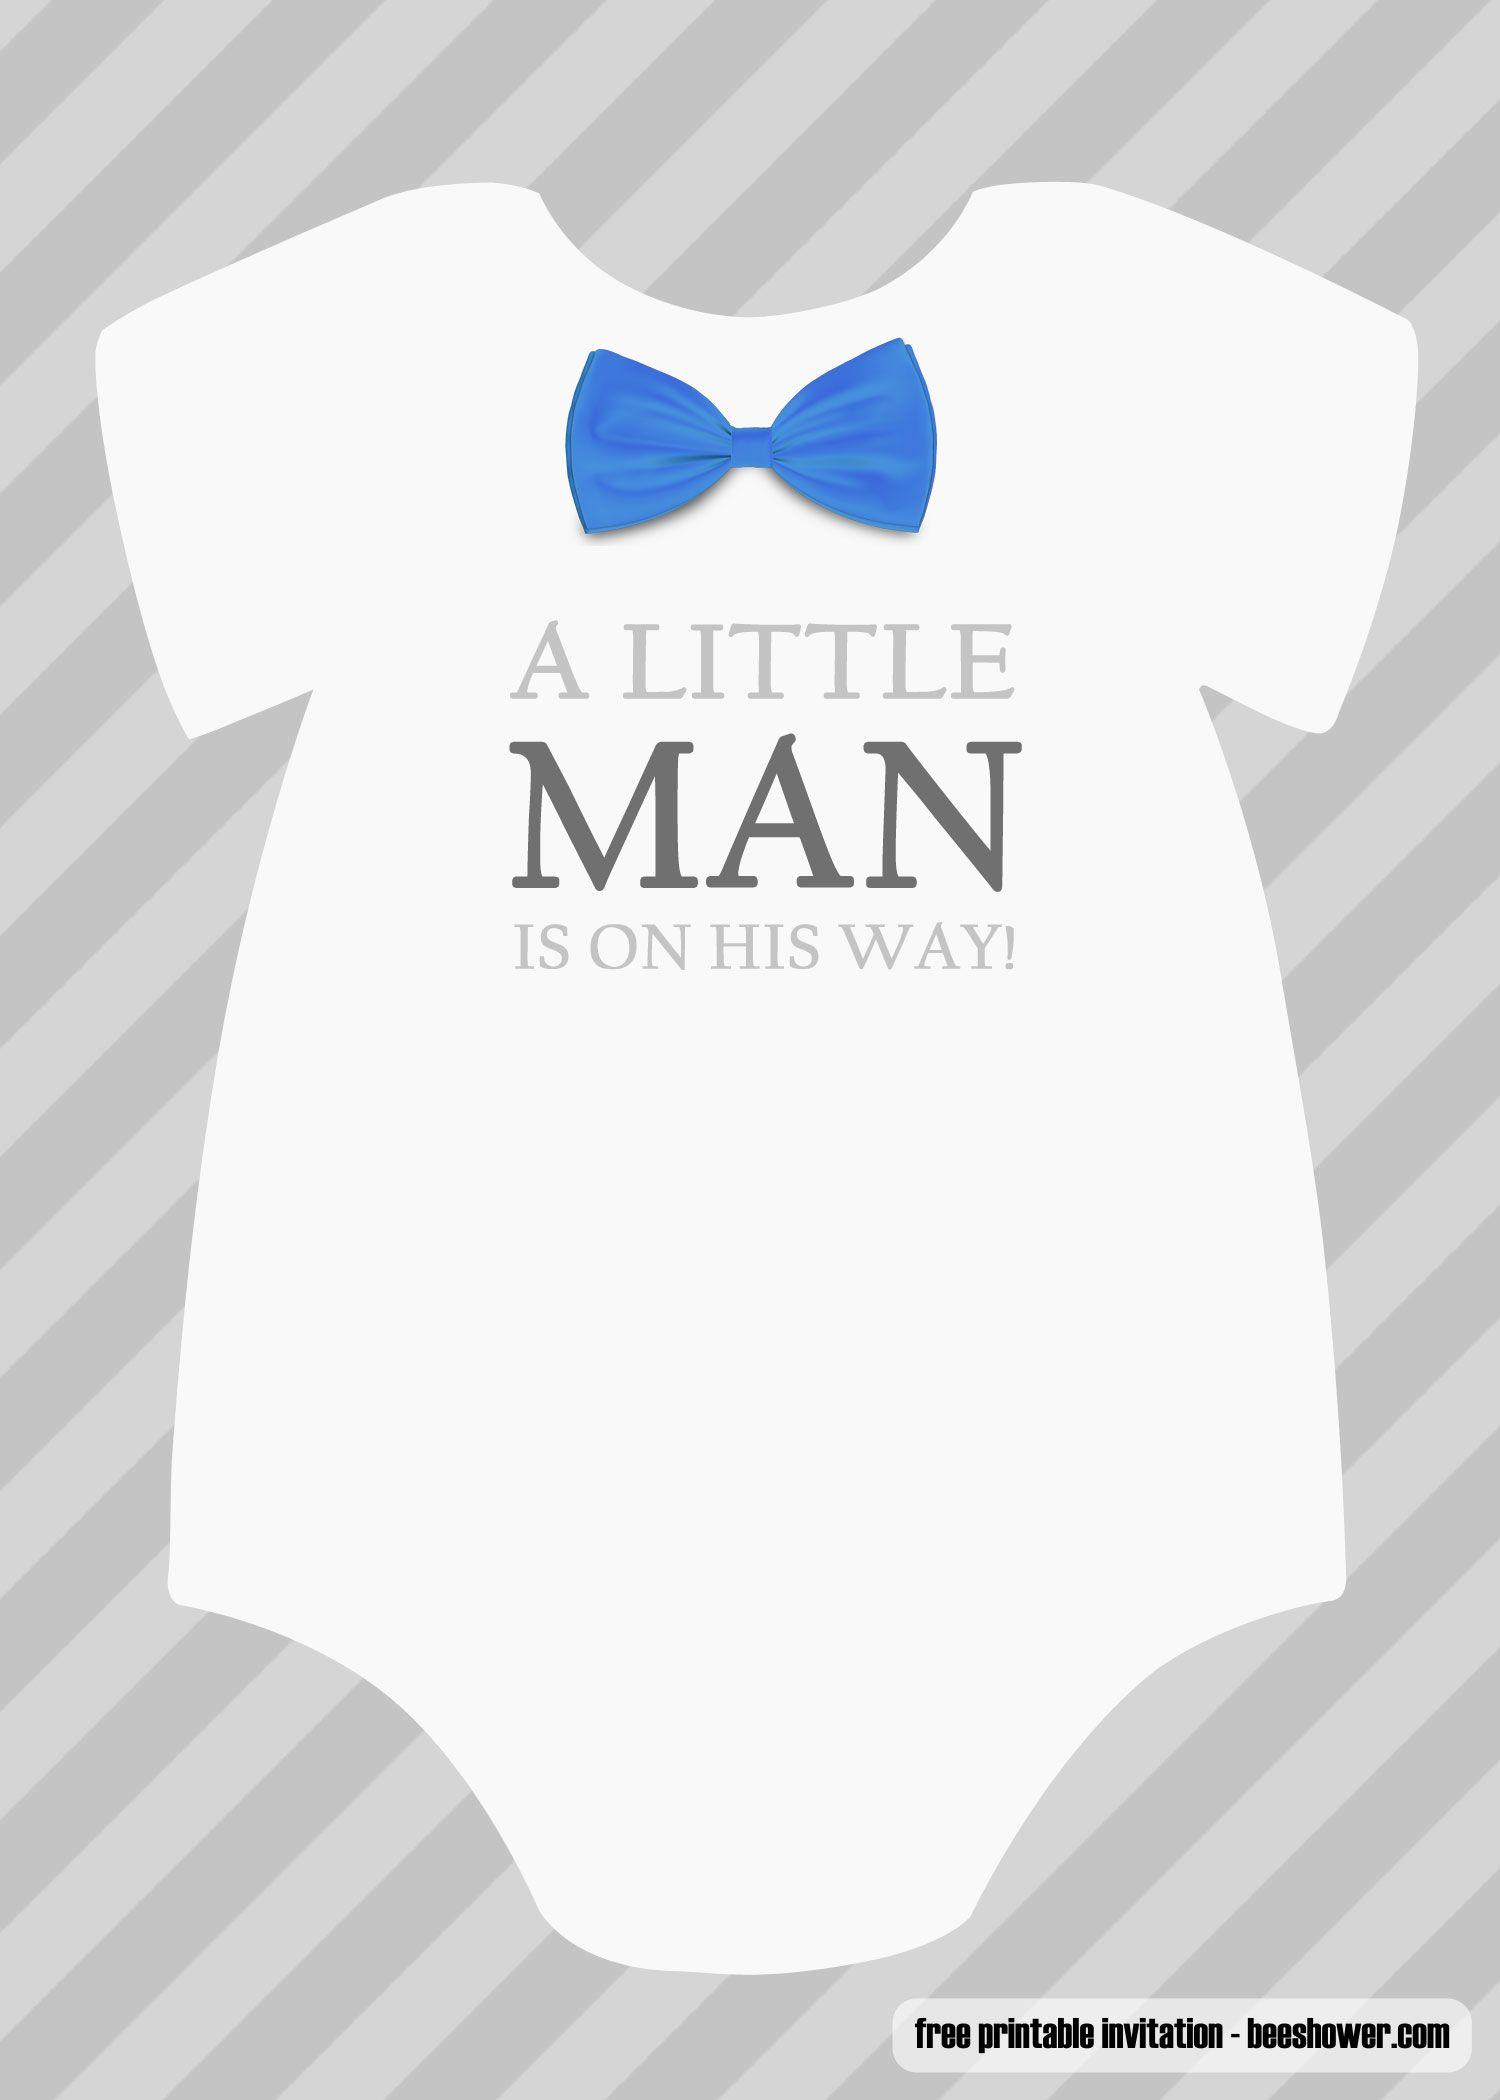 FREE Boy Baby Shower Invitations Templates  FREE Prin  Boy baby